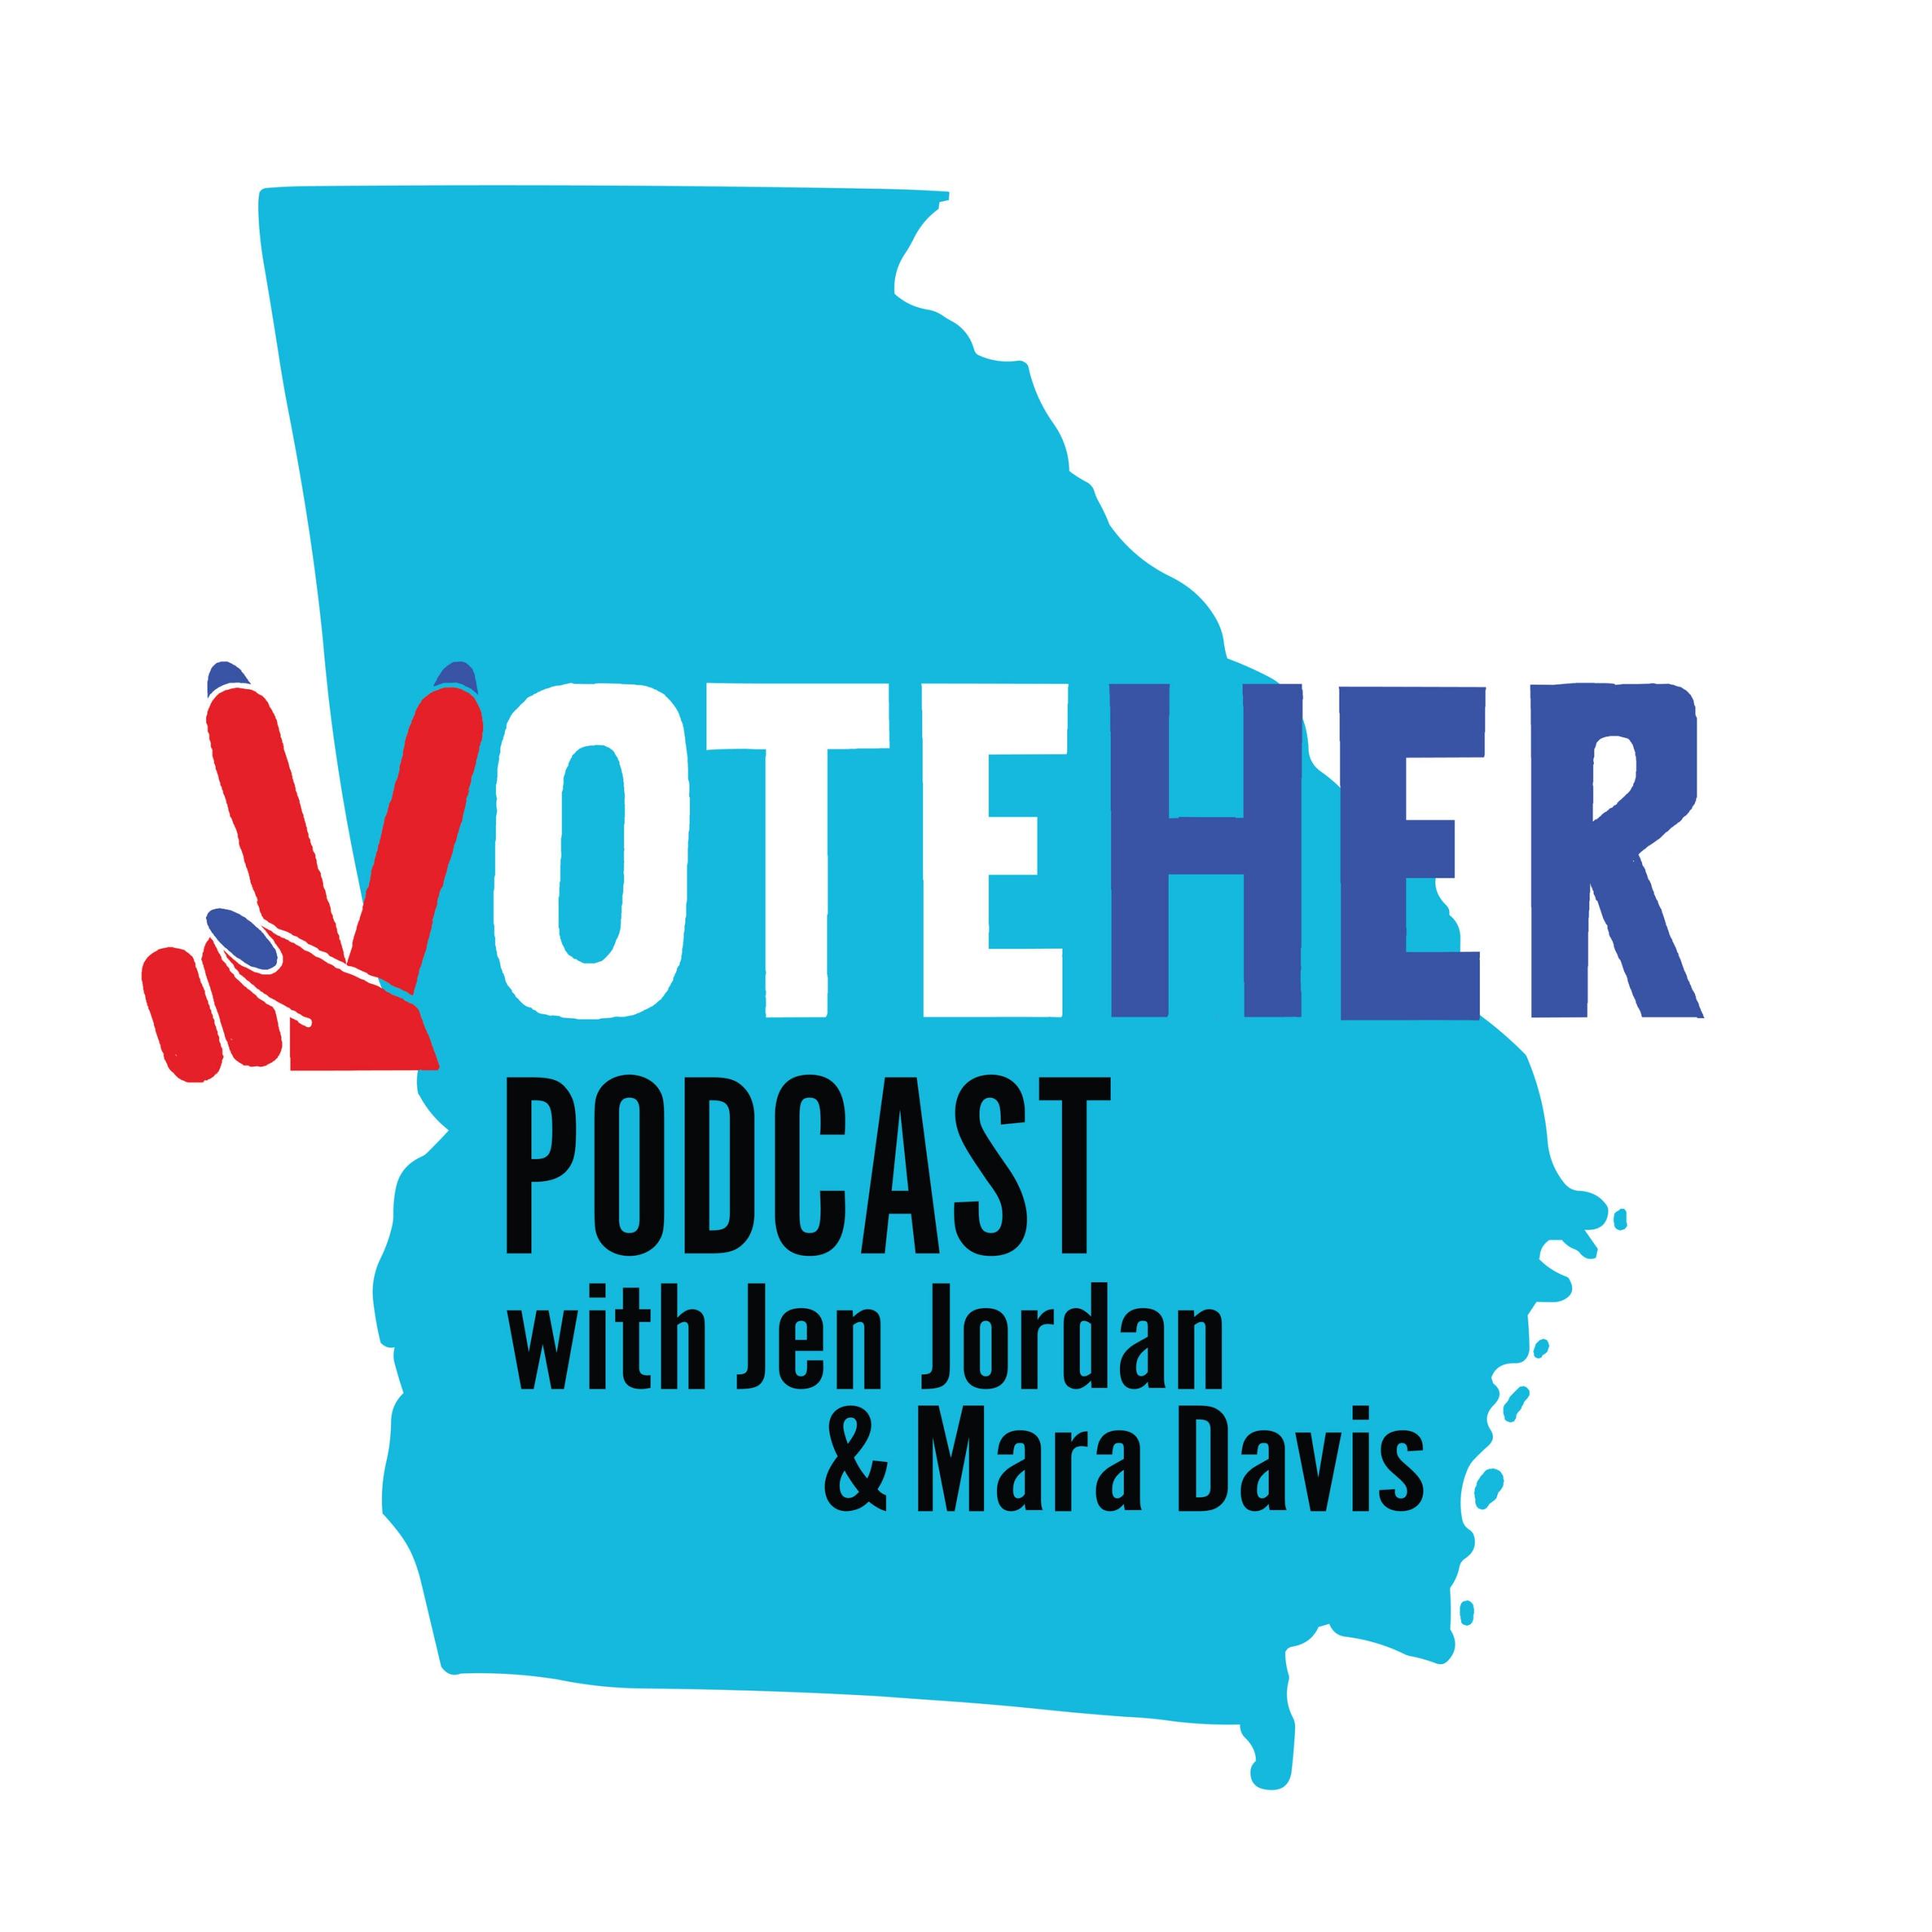 Vote Her Podcast logo